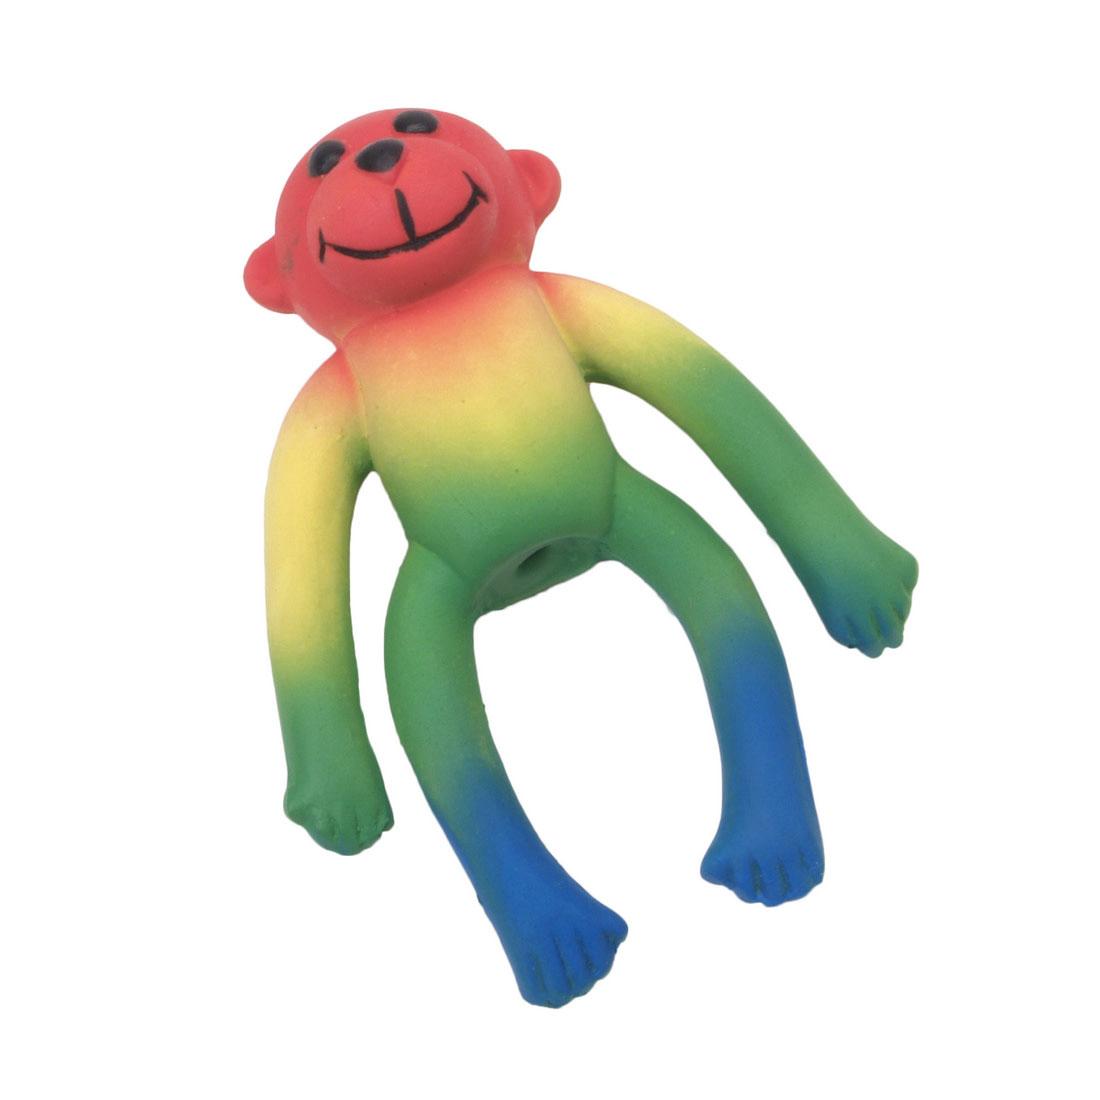 Li'l Pals Latex Monkey Dog Toy, Multi-color, 4-in